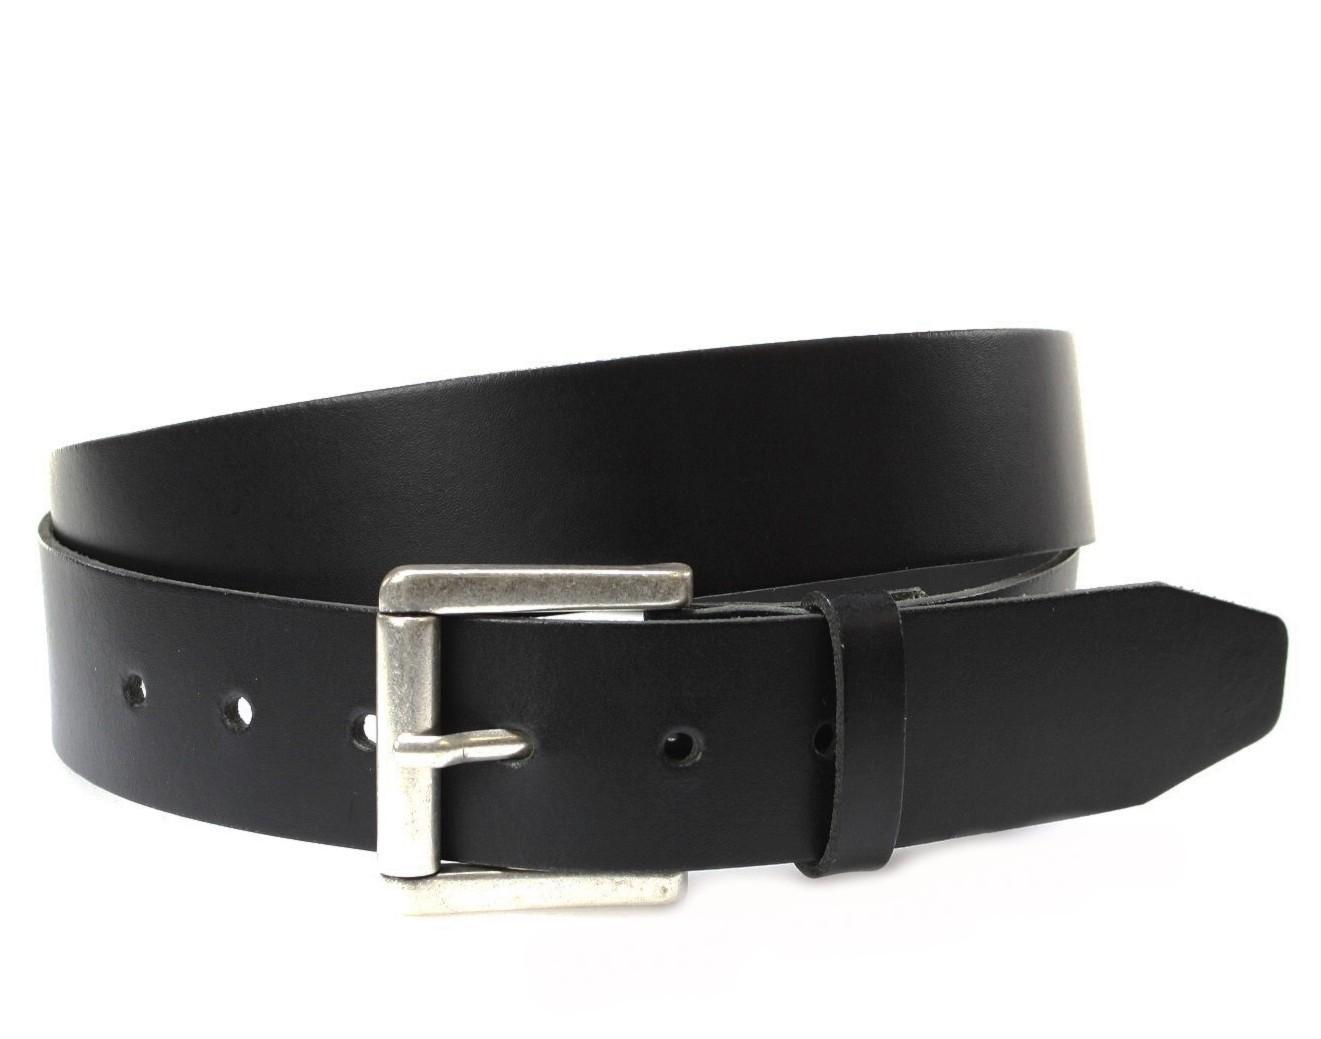 Vanzetti V4422-791 leather belt extra long - black